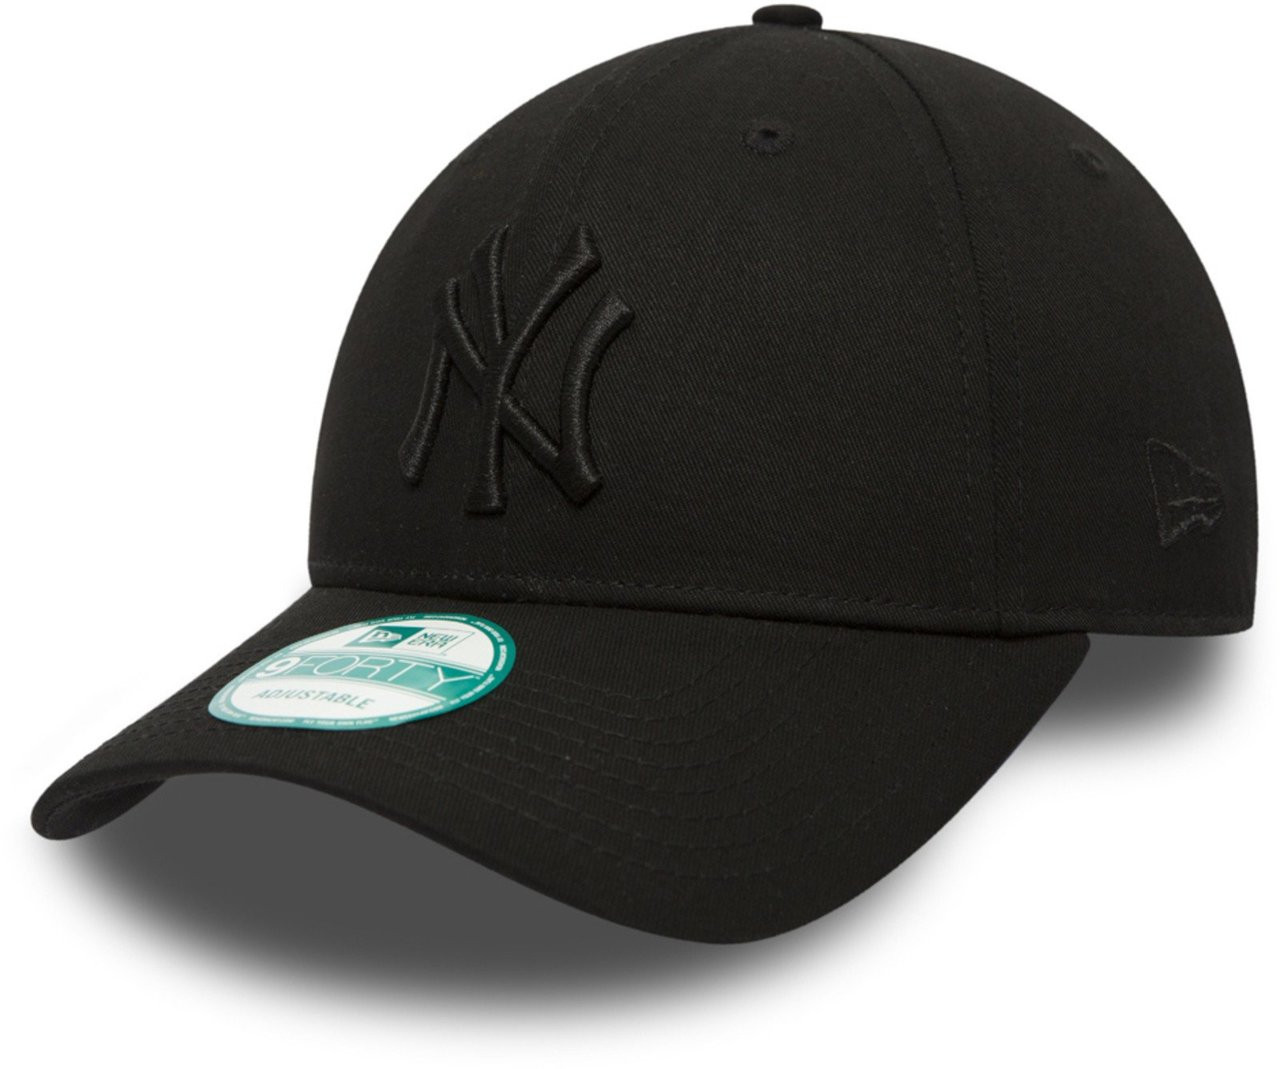 NY Yankees Black/Black Nine Forty Adjustable Cap photo